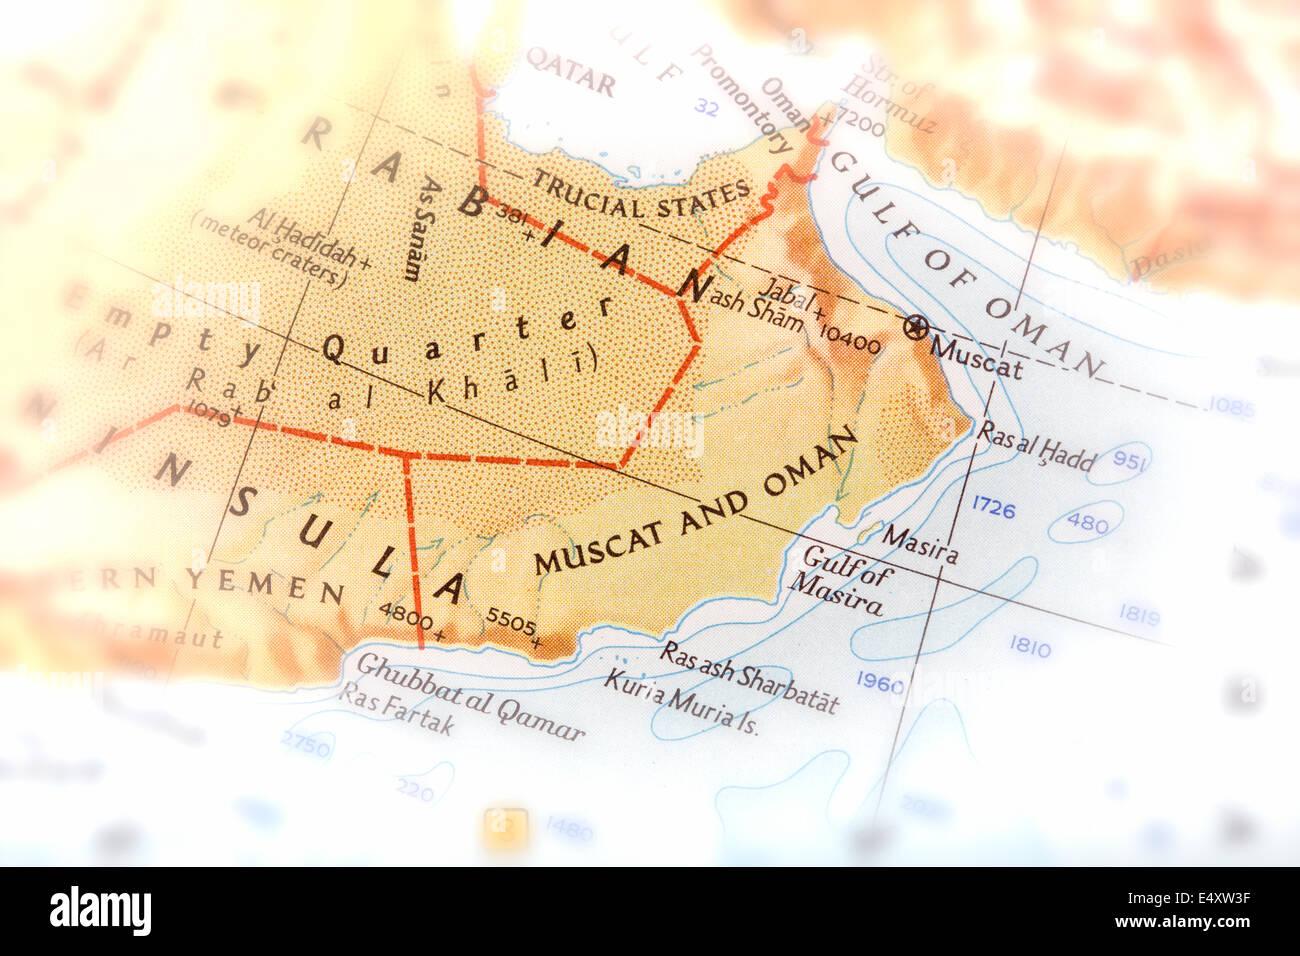 Traveler focused on Oman - preparation for the journey - Stock Image